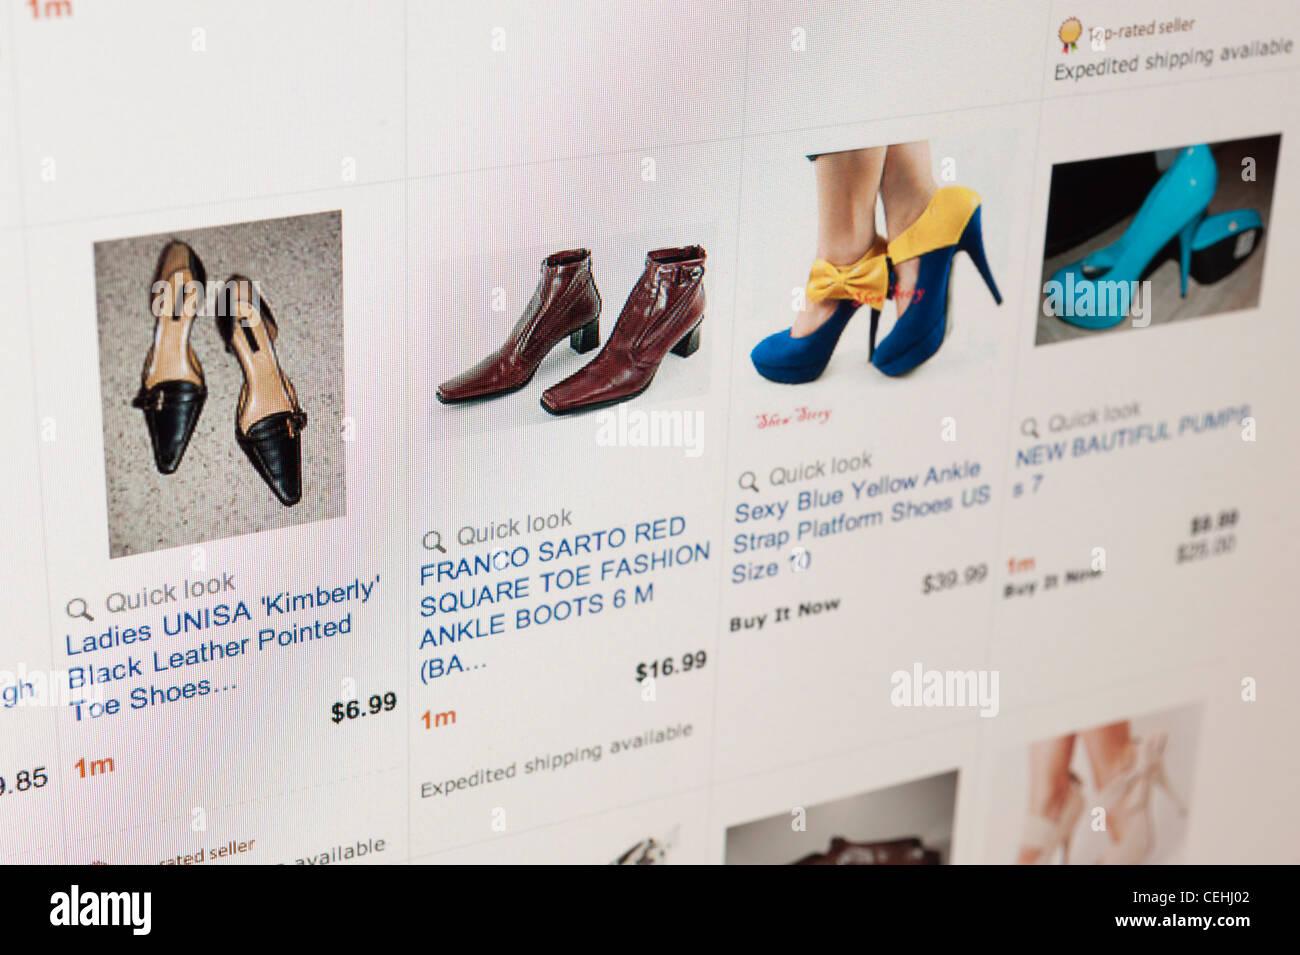 488cd5373be Shoes E Stock Photos   Shoes E Stock Images - Alamy